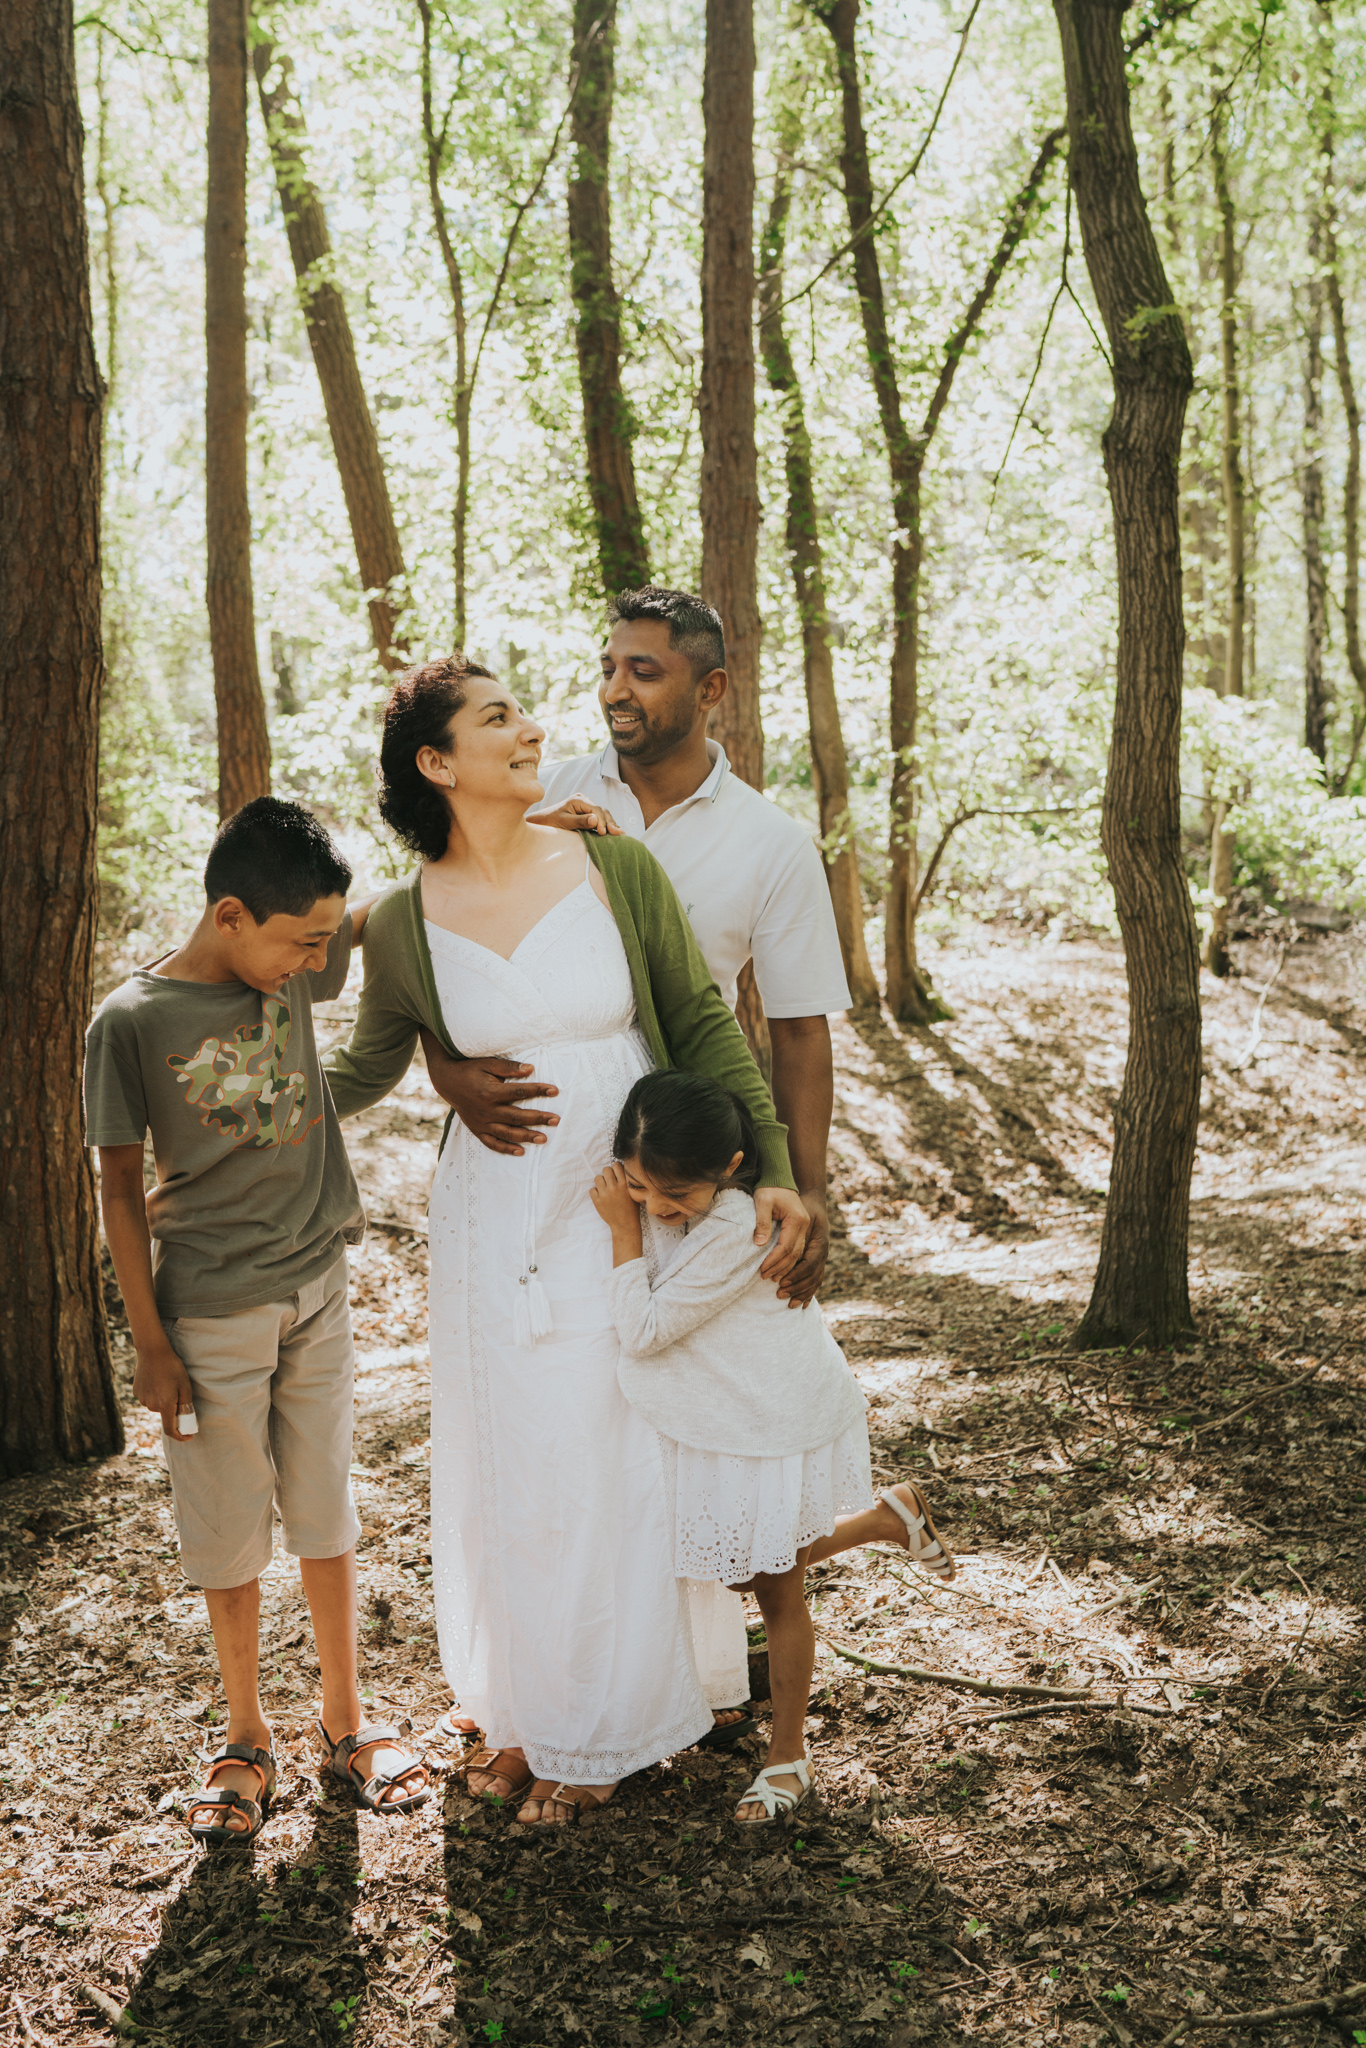 Chandrasiri-Family-Session-Woodland-Colchester-Essex-Grace-Elizabeth-Alternative-Wedding-Photographer (1 of 1).jpg (3 of 34).jpg